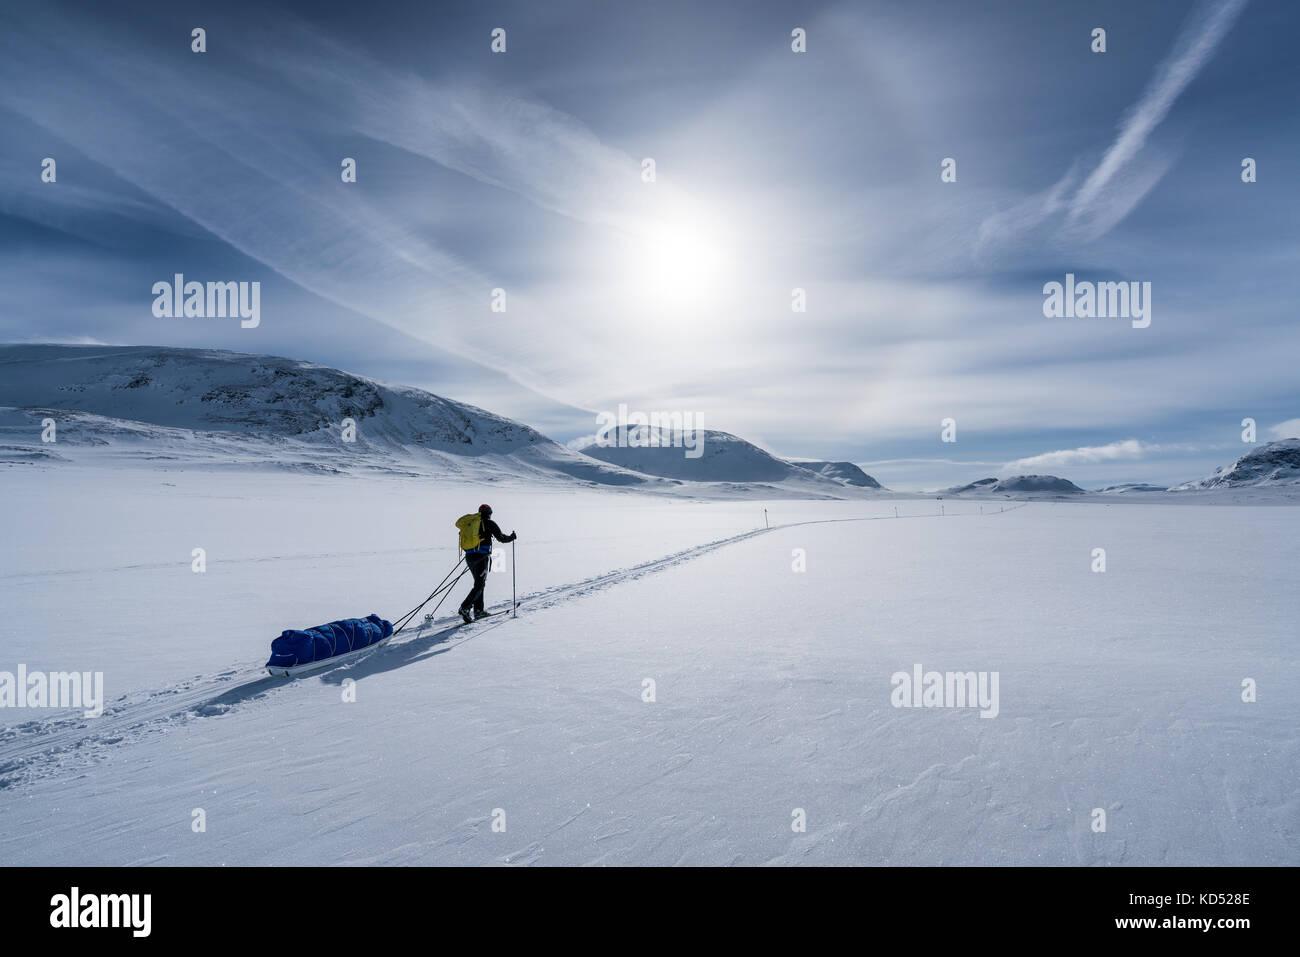 Skitouren in der kebnekaise massive Gebirge, kiiruna, Schweden, Europa Stockbild